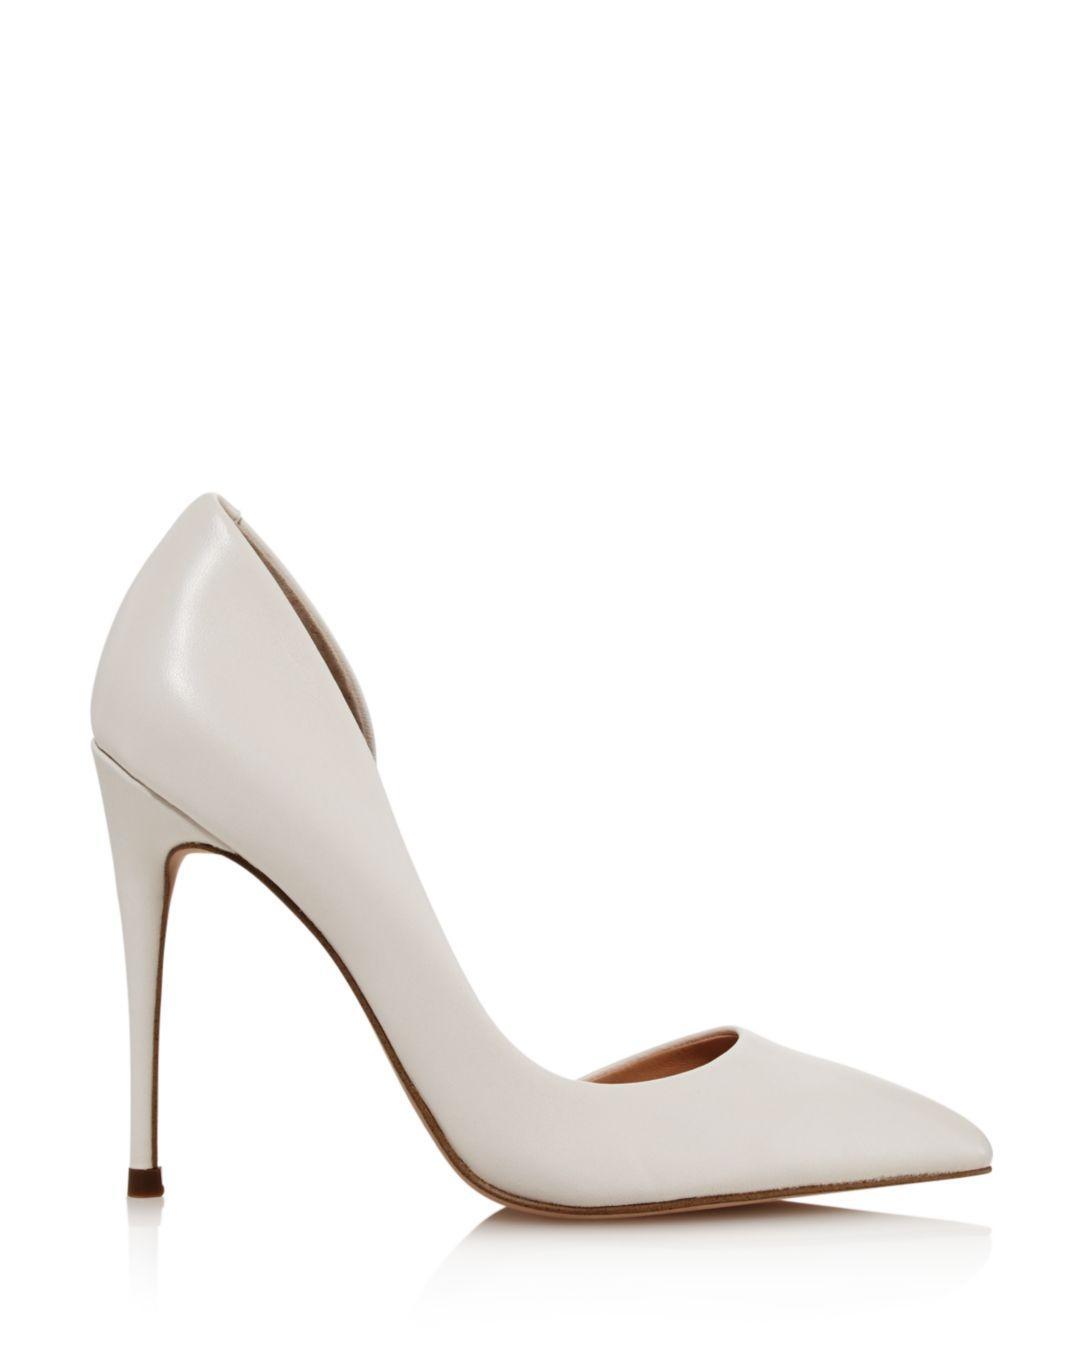 4ffa84146 Aqua Women's Dion Half D'orsay High-heel Pumps in White - Lyst